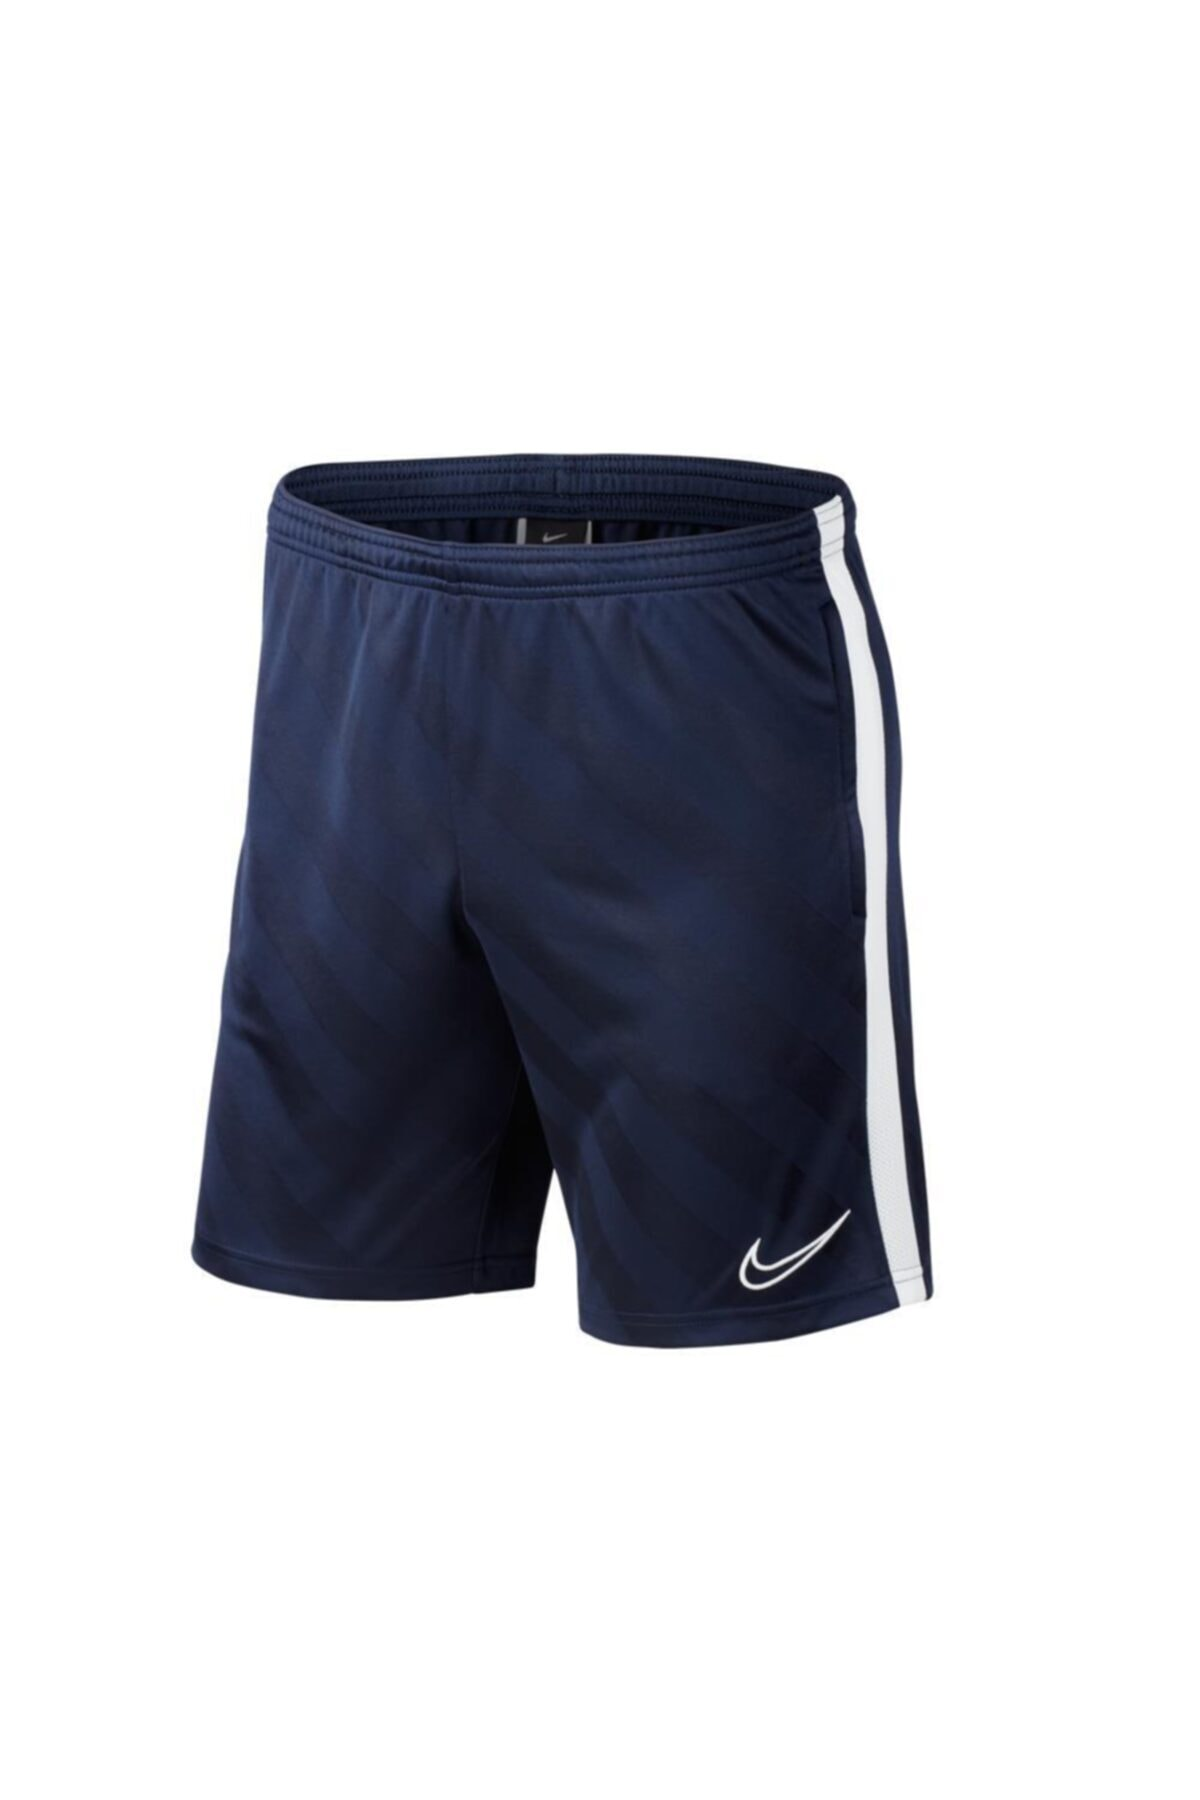 فروش شلوارک مردانه اصل و جدید برند Nike رنگ لاجوردی کد ty6130383